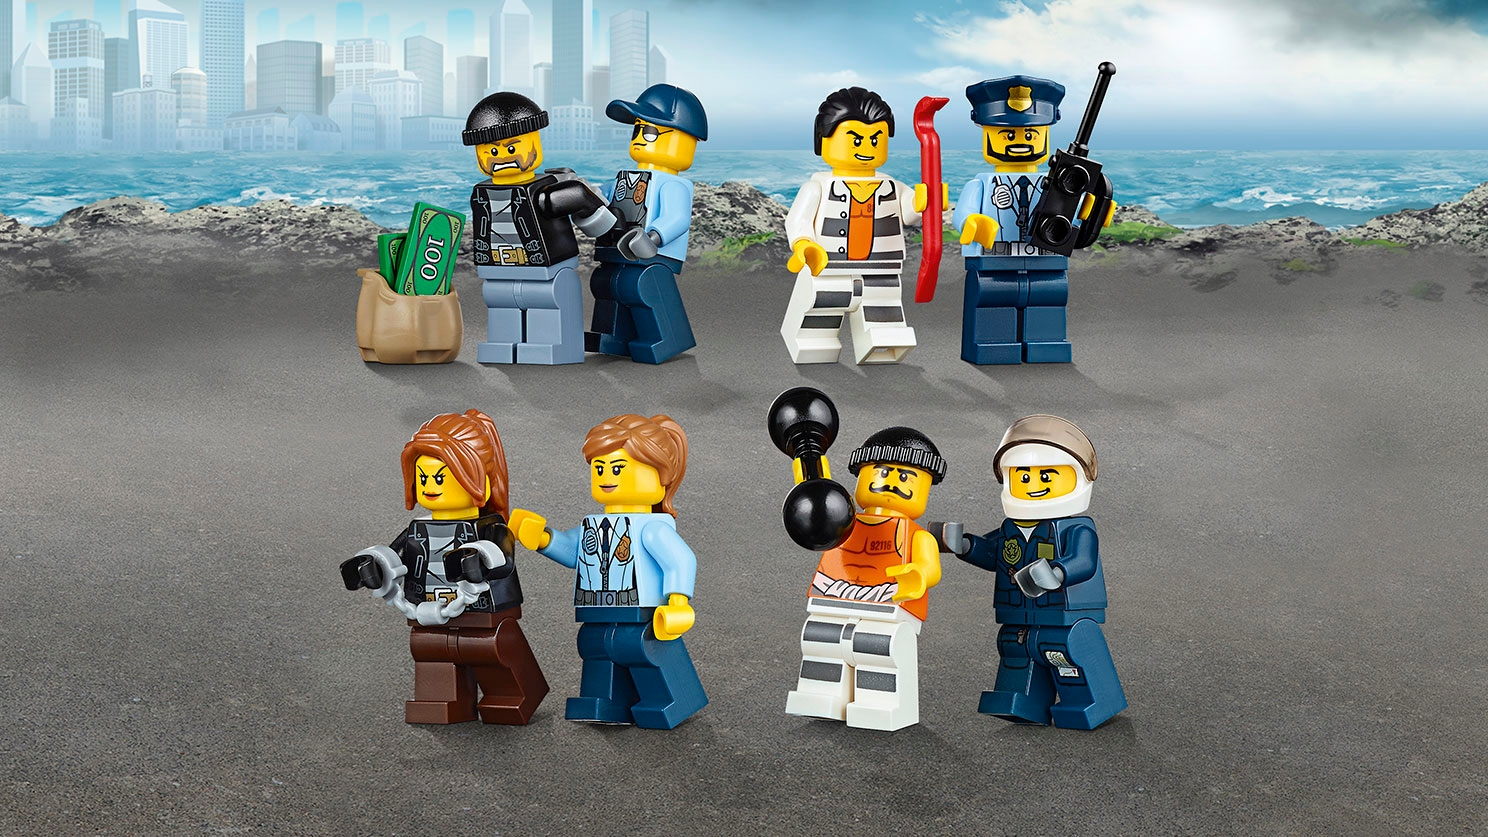 Prison Island 60130 LEGO City Sets for kids GB